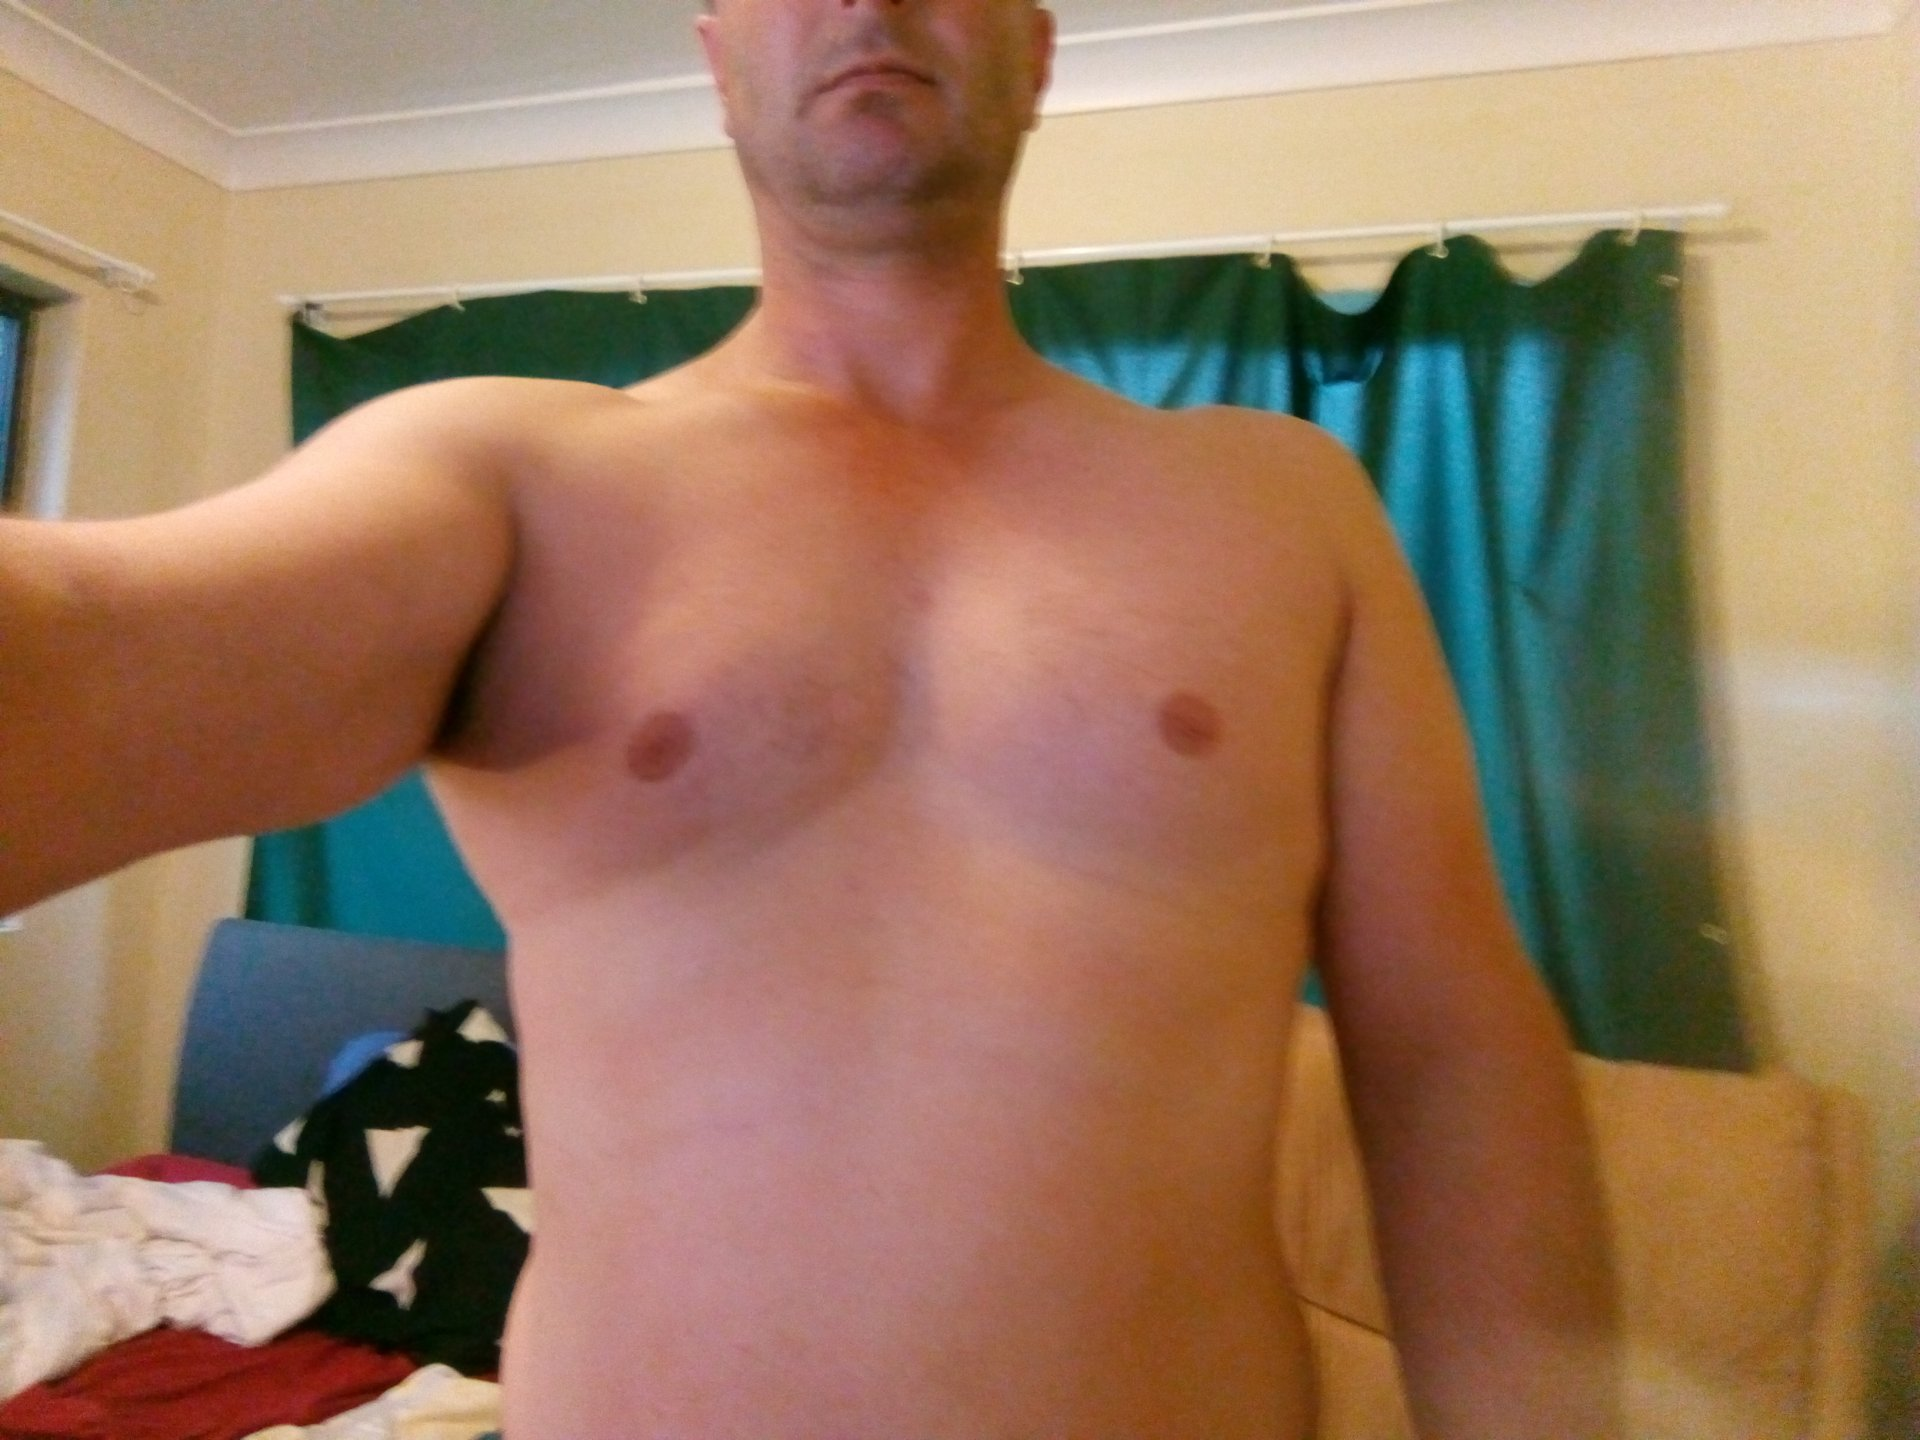 4me2be2deep-inside-U from New South Wales,Australia